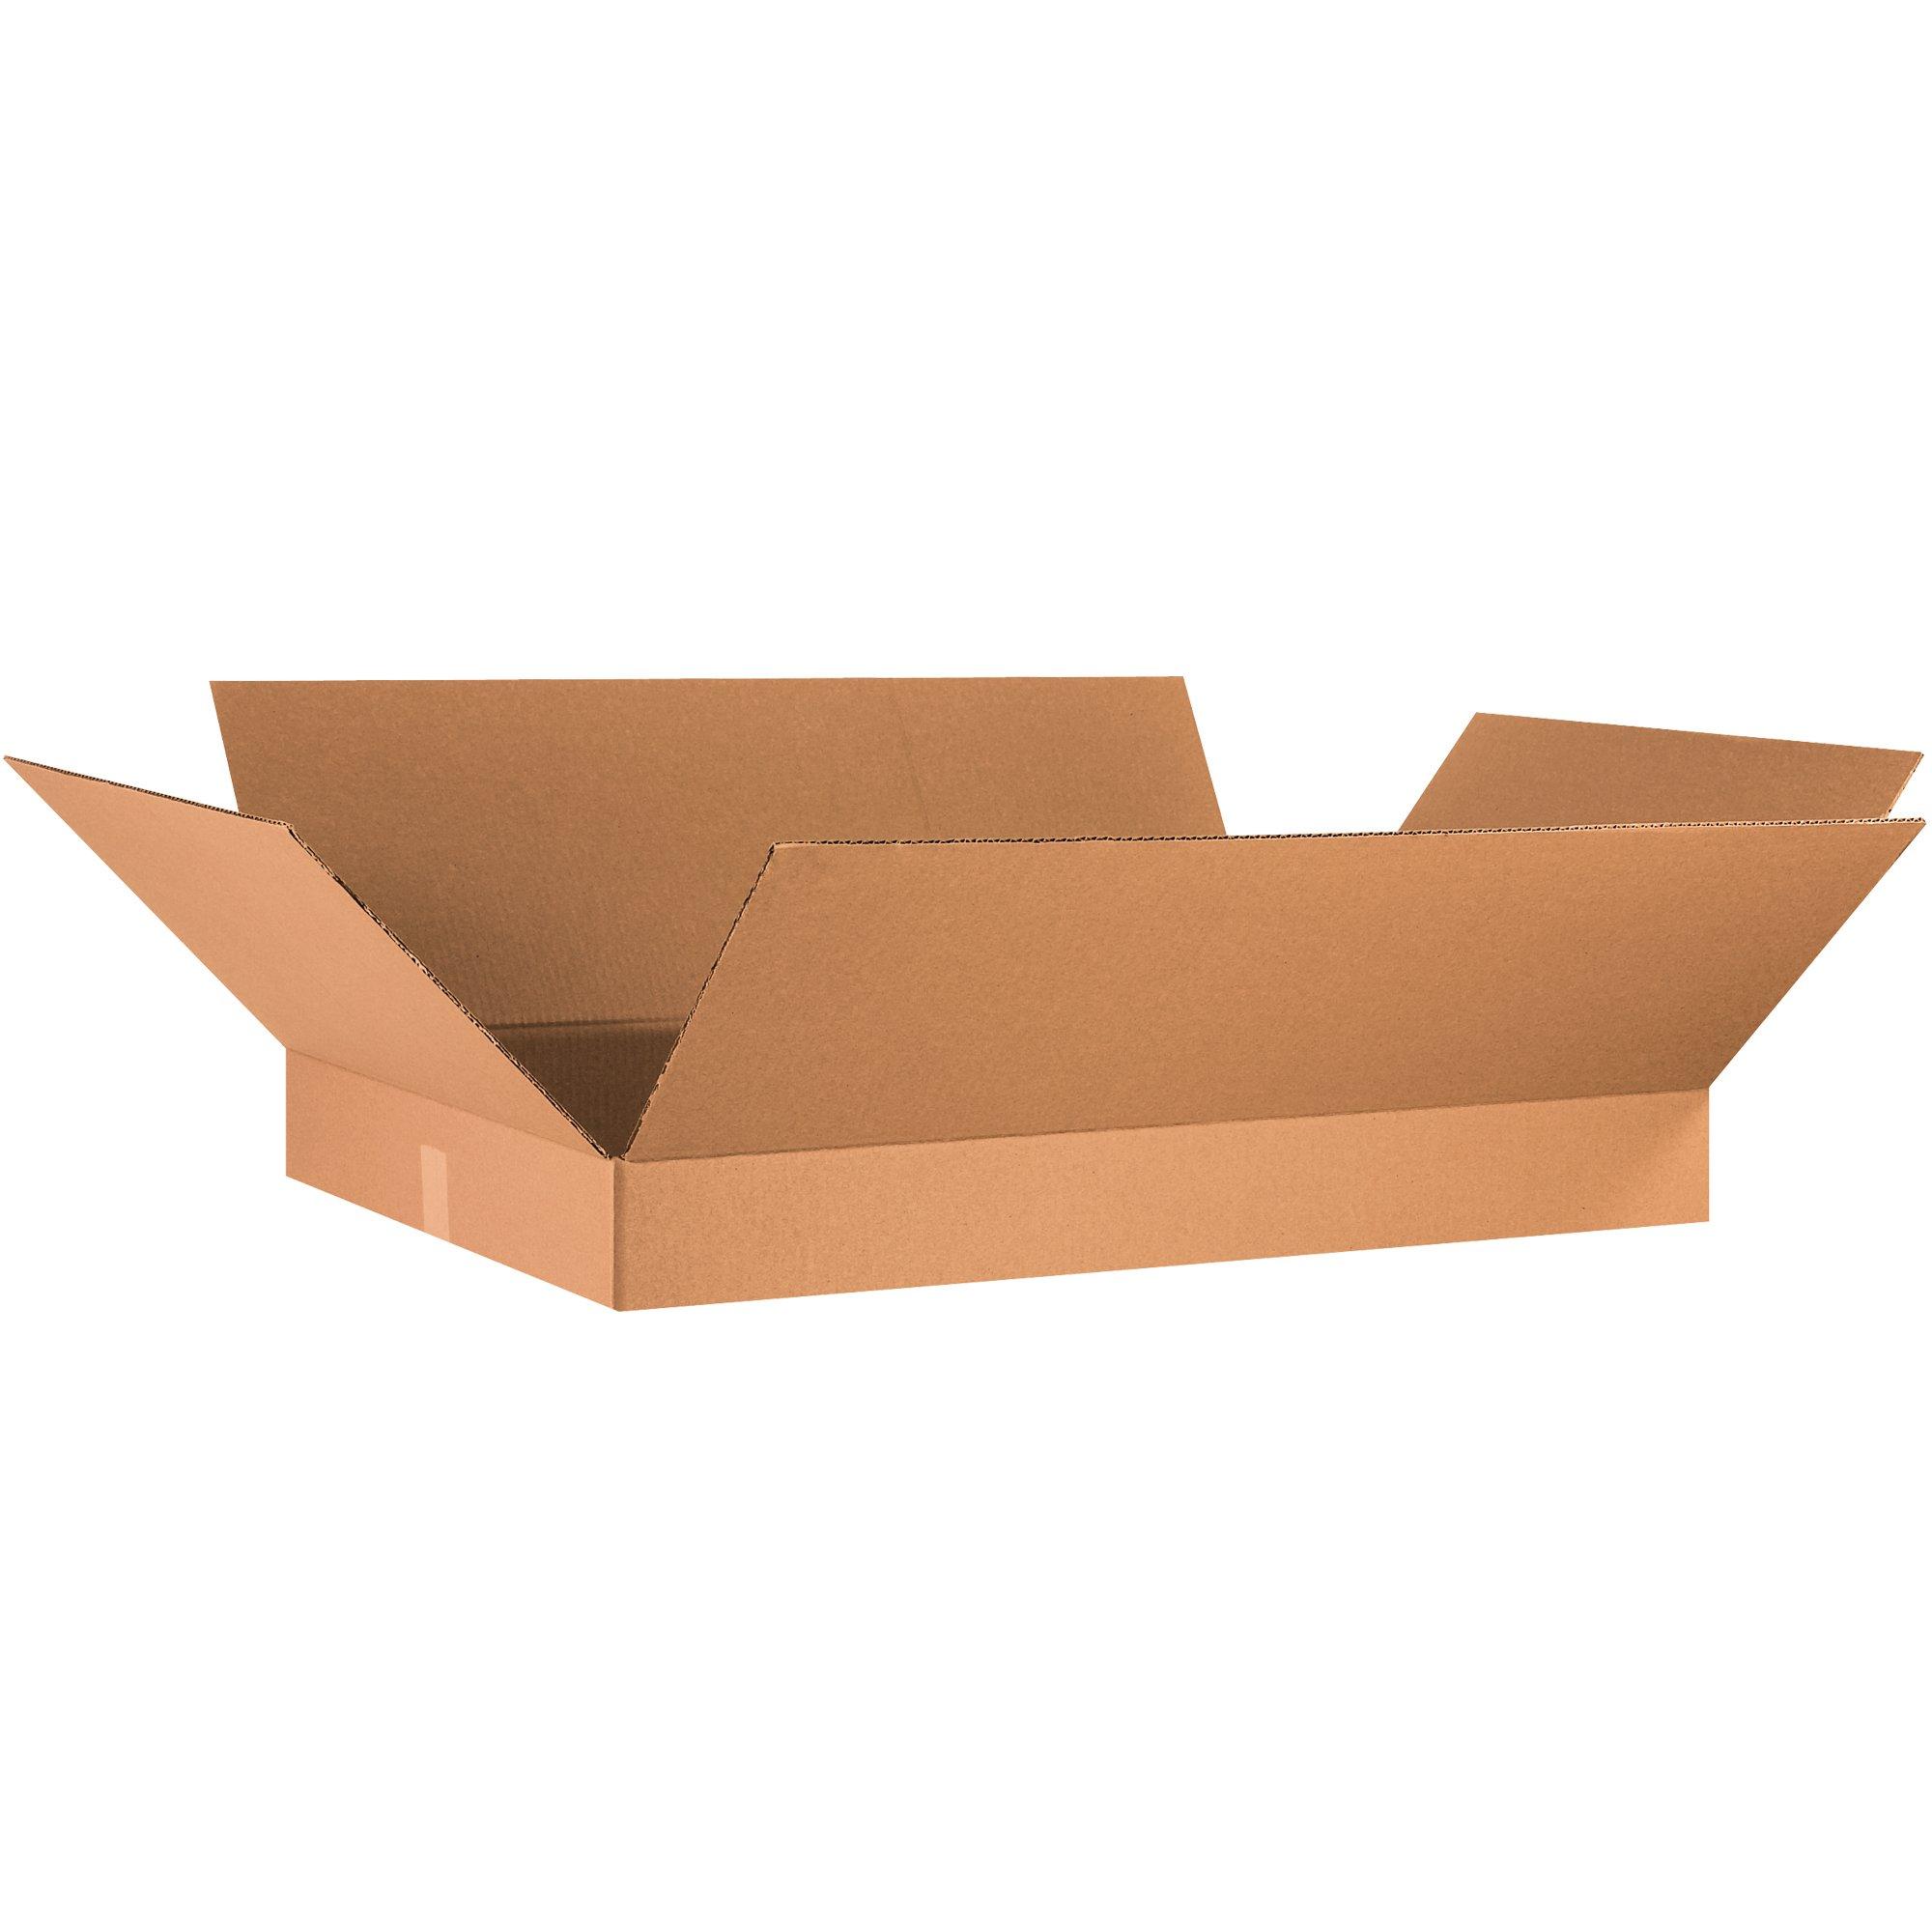 Aviditi 36244 Flat Corrugated Box, 36'' Length x 24'' Width x 4'' Height, Kraft (Bundle of 10)